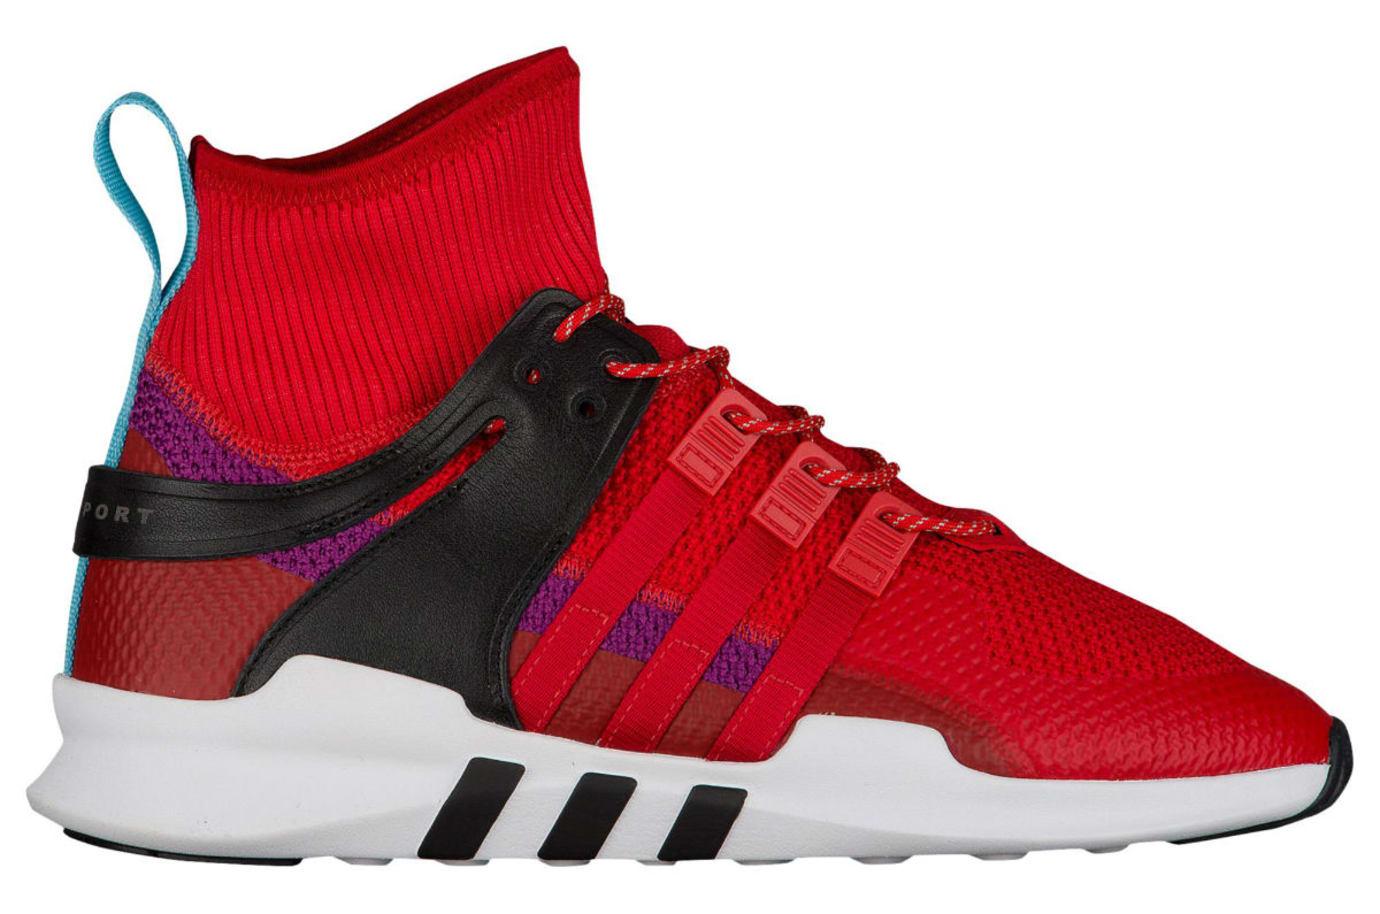 56c5e982a0a5 Adidas EQT Support ADV Winter Scarlet Shock Purple Release Date Profile